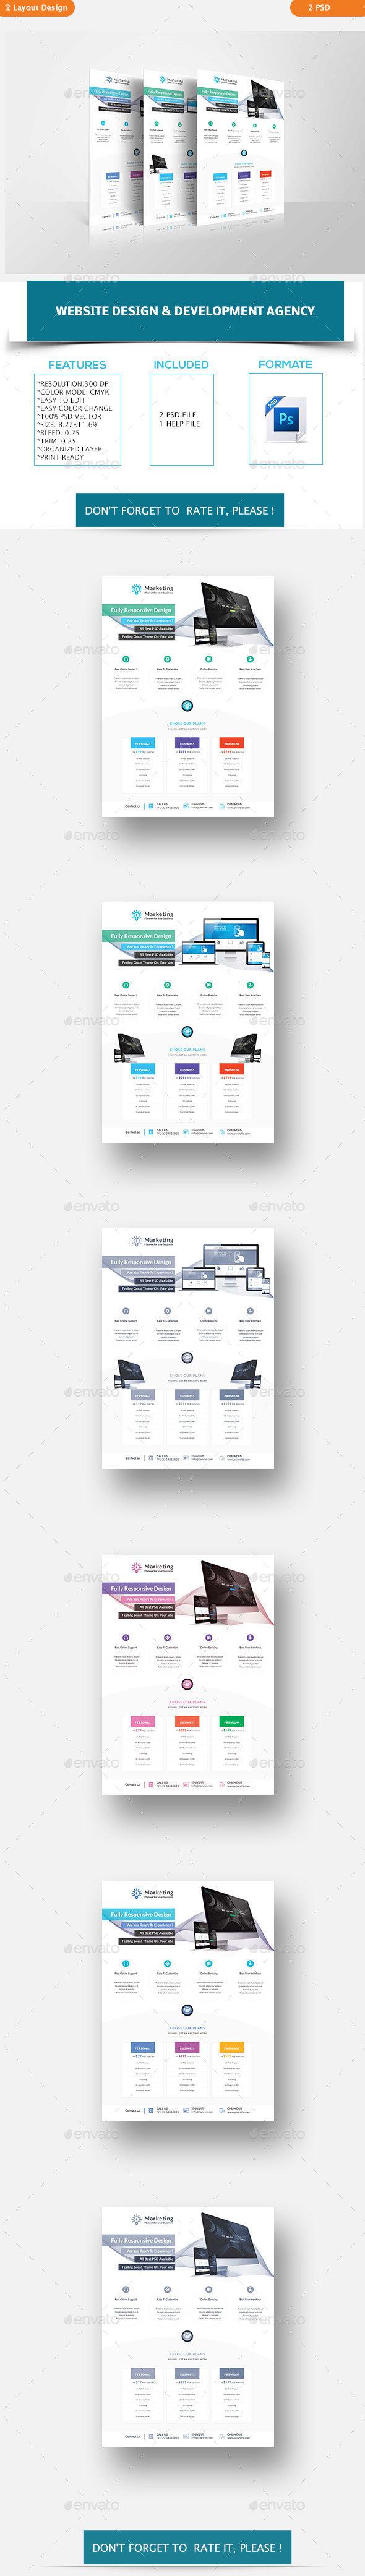 Website Design & Development Agency Flyers - Corporate Flyers